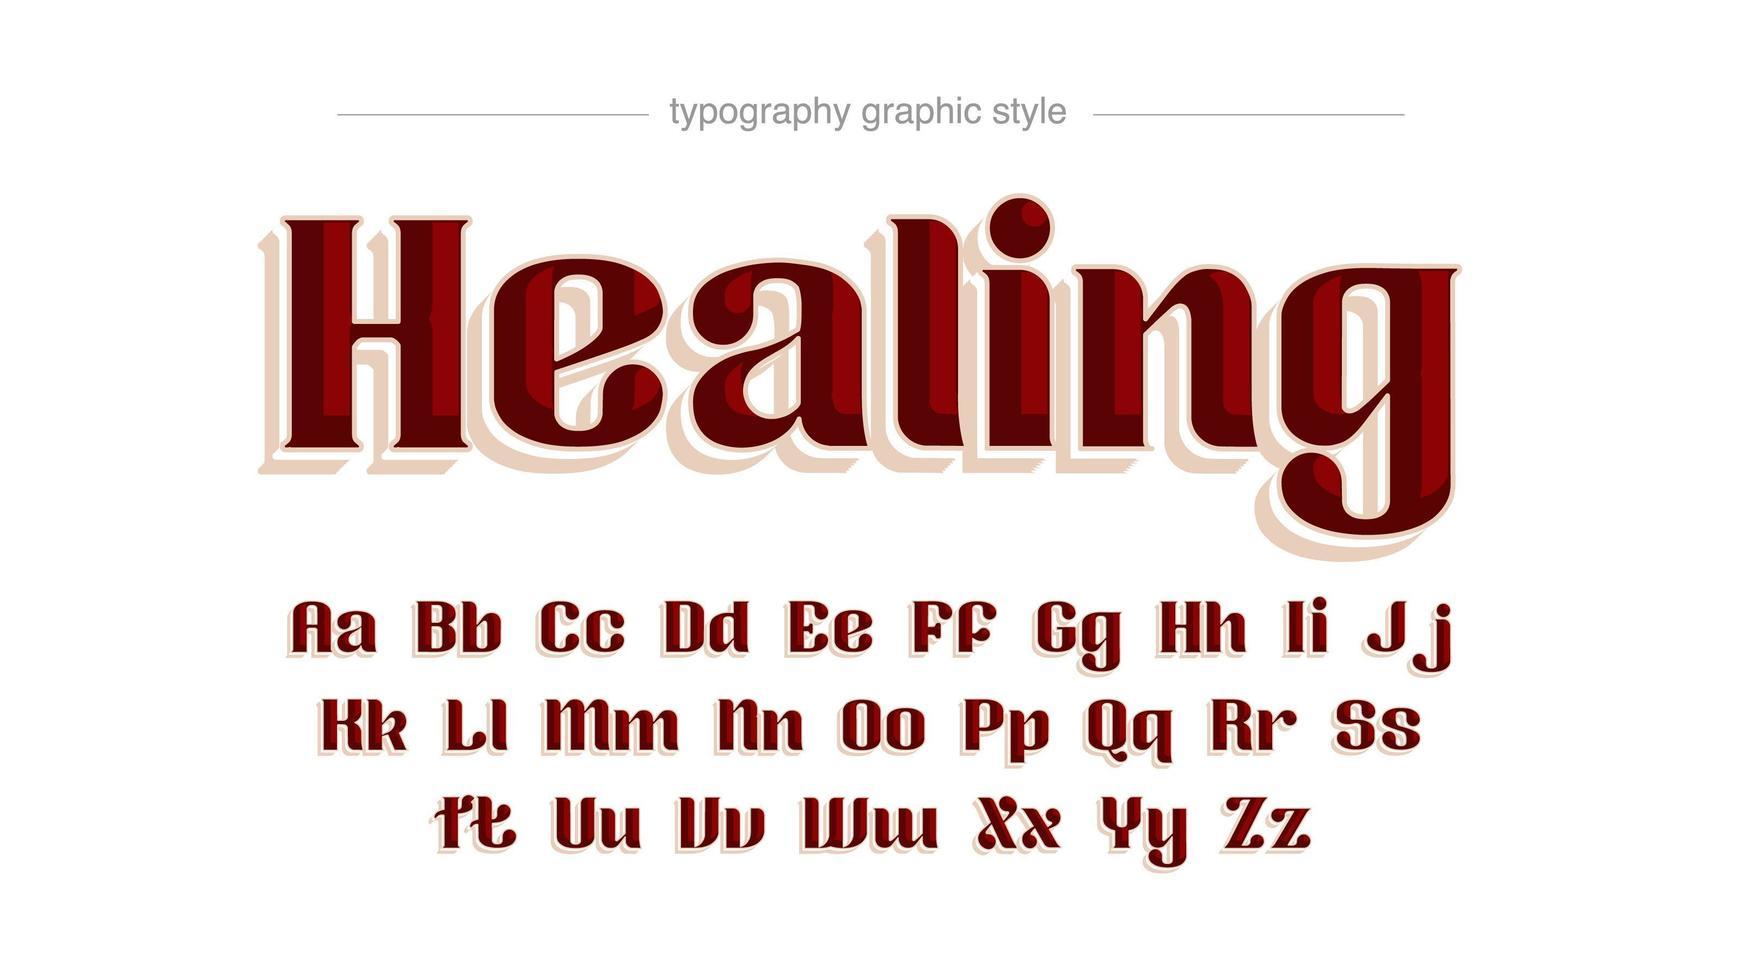 tipografia serif retrò rosso elegante vettore